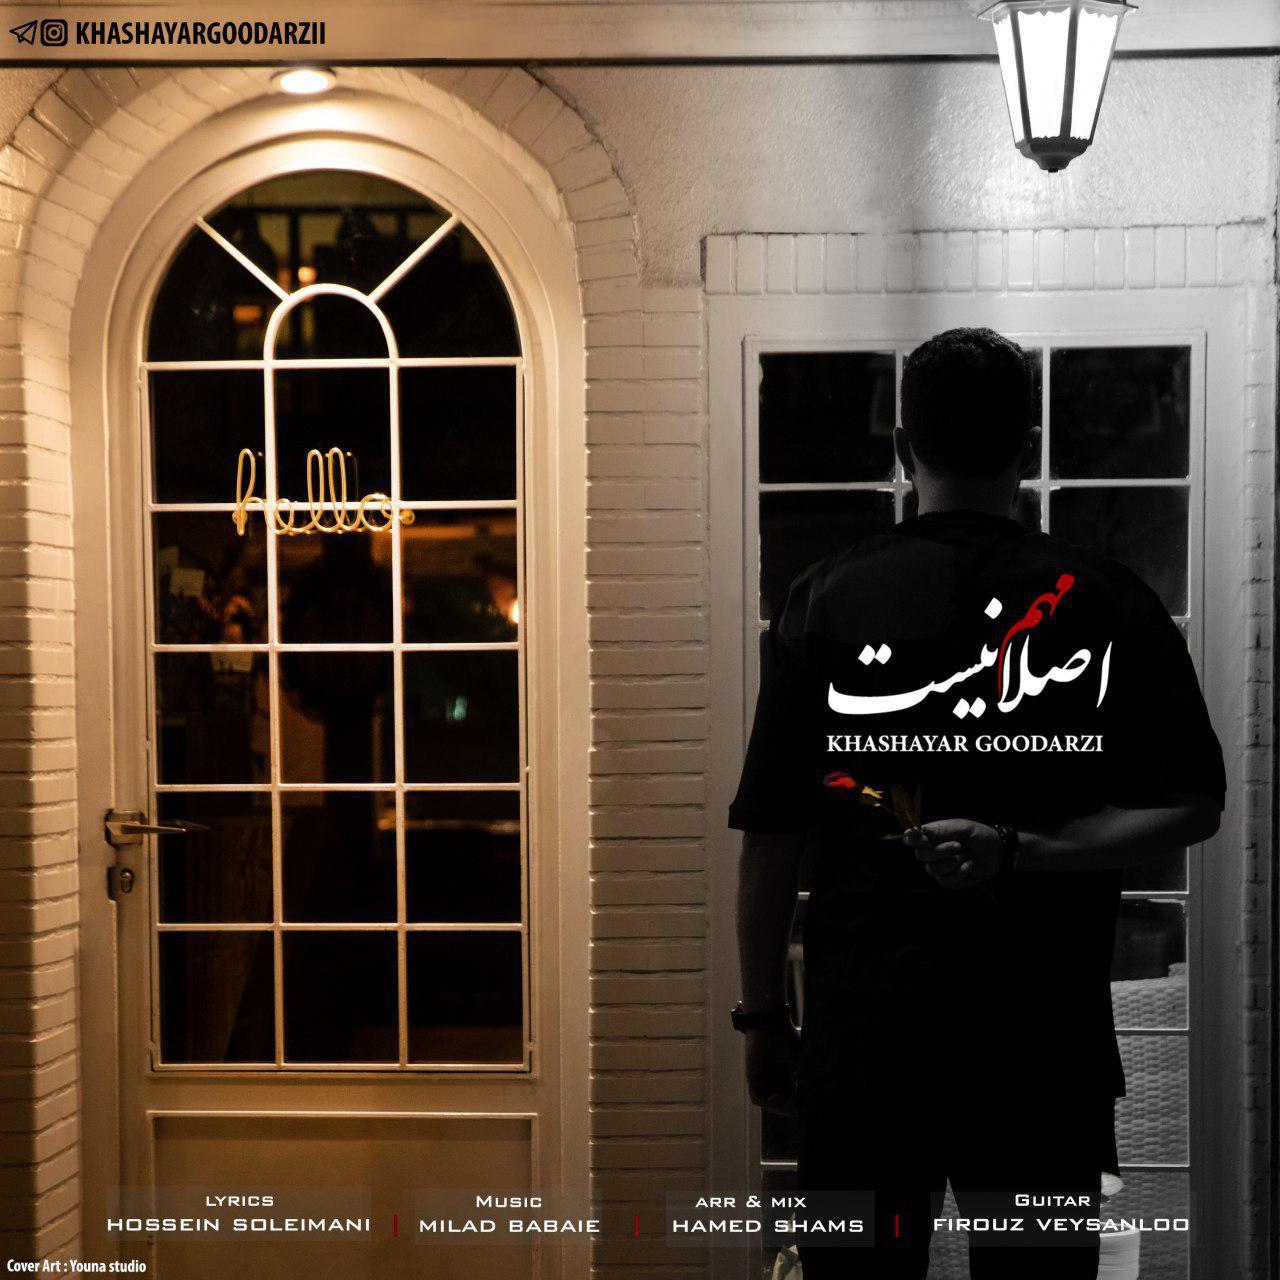 Khashayar Goodarzi – Aslan Mohem Nist